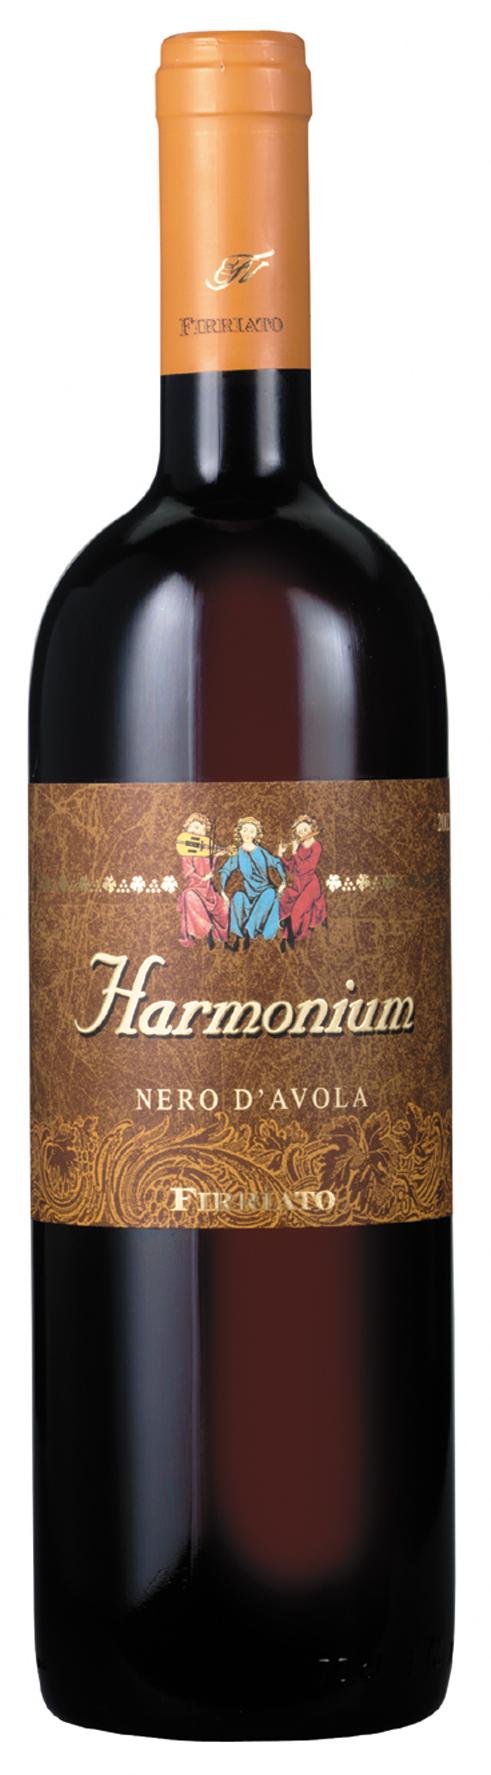 Firriato Harmonium Nero d'Avola (2013)